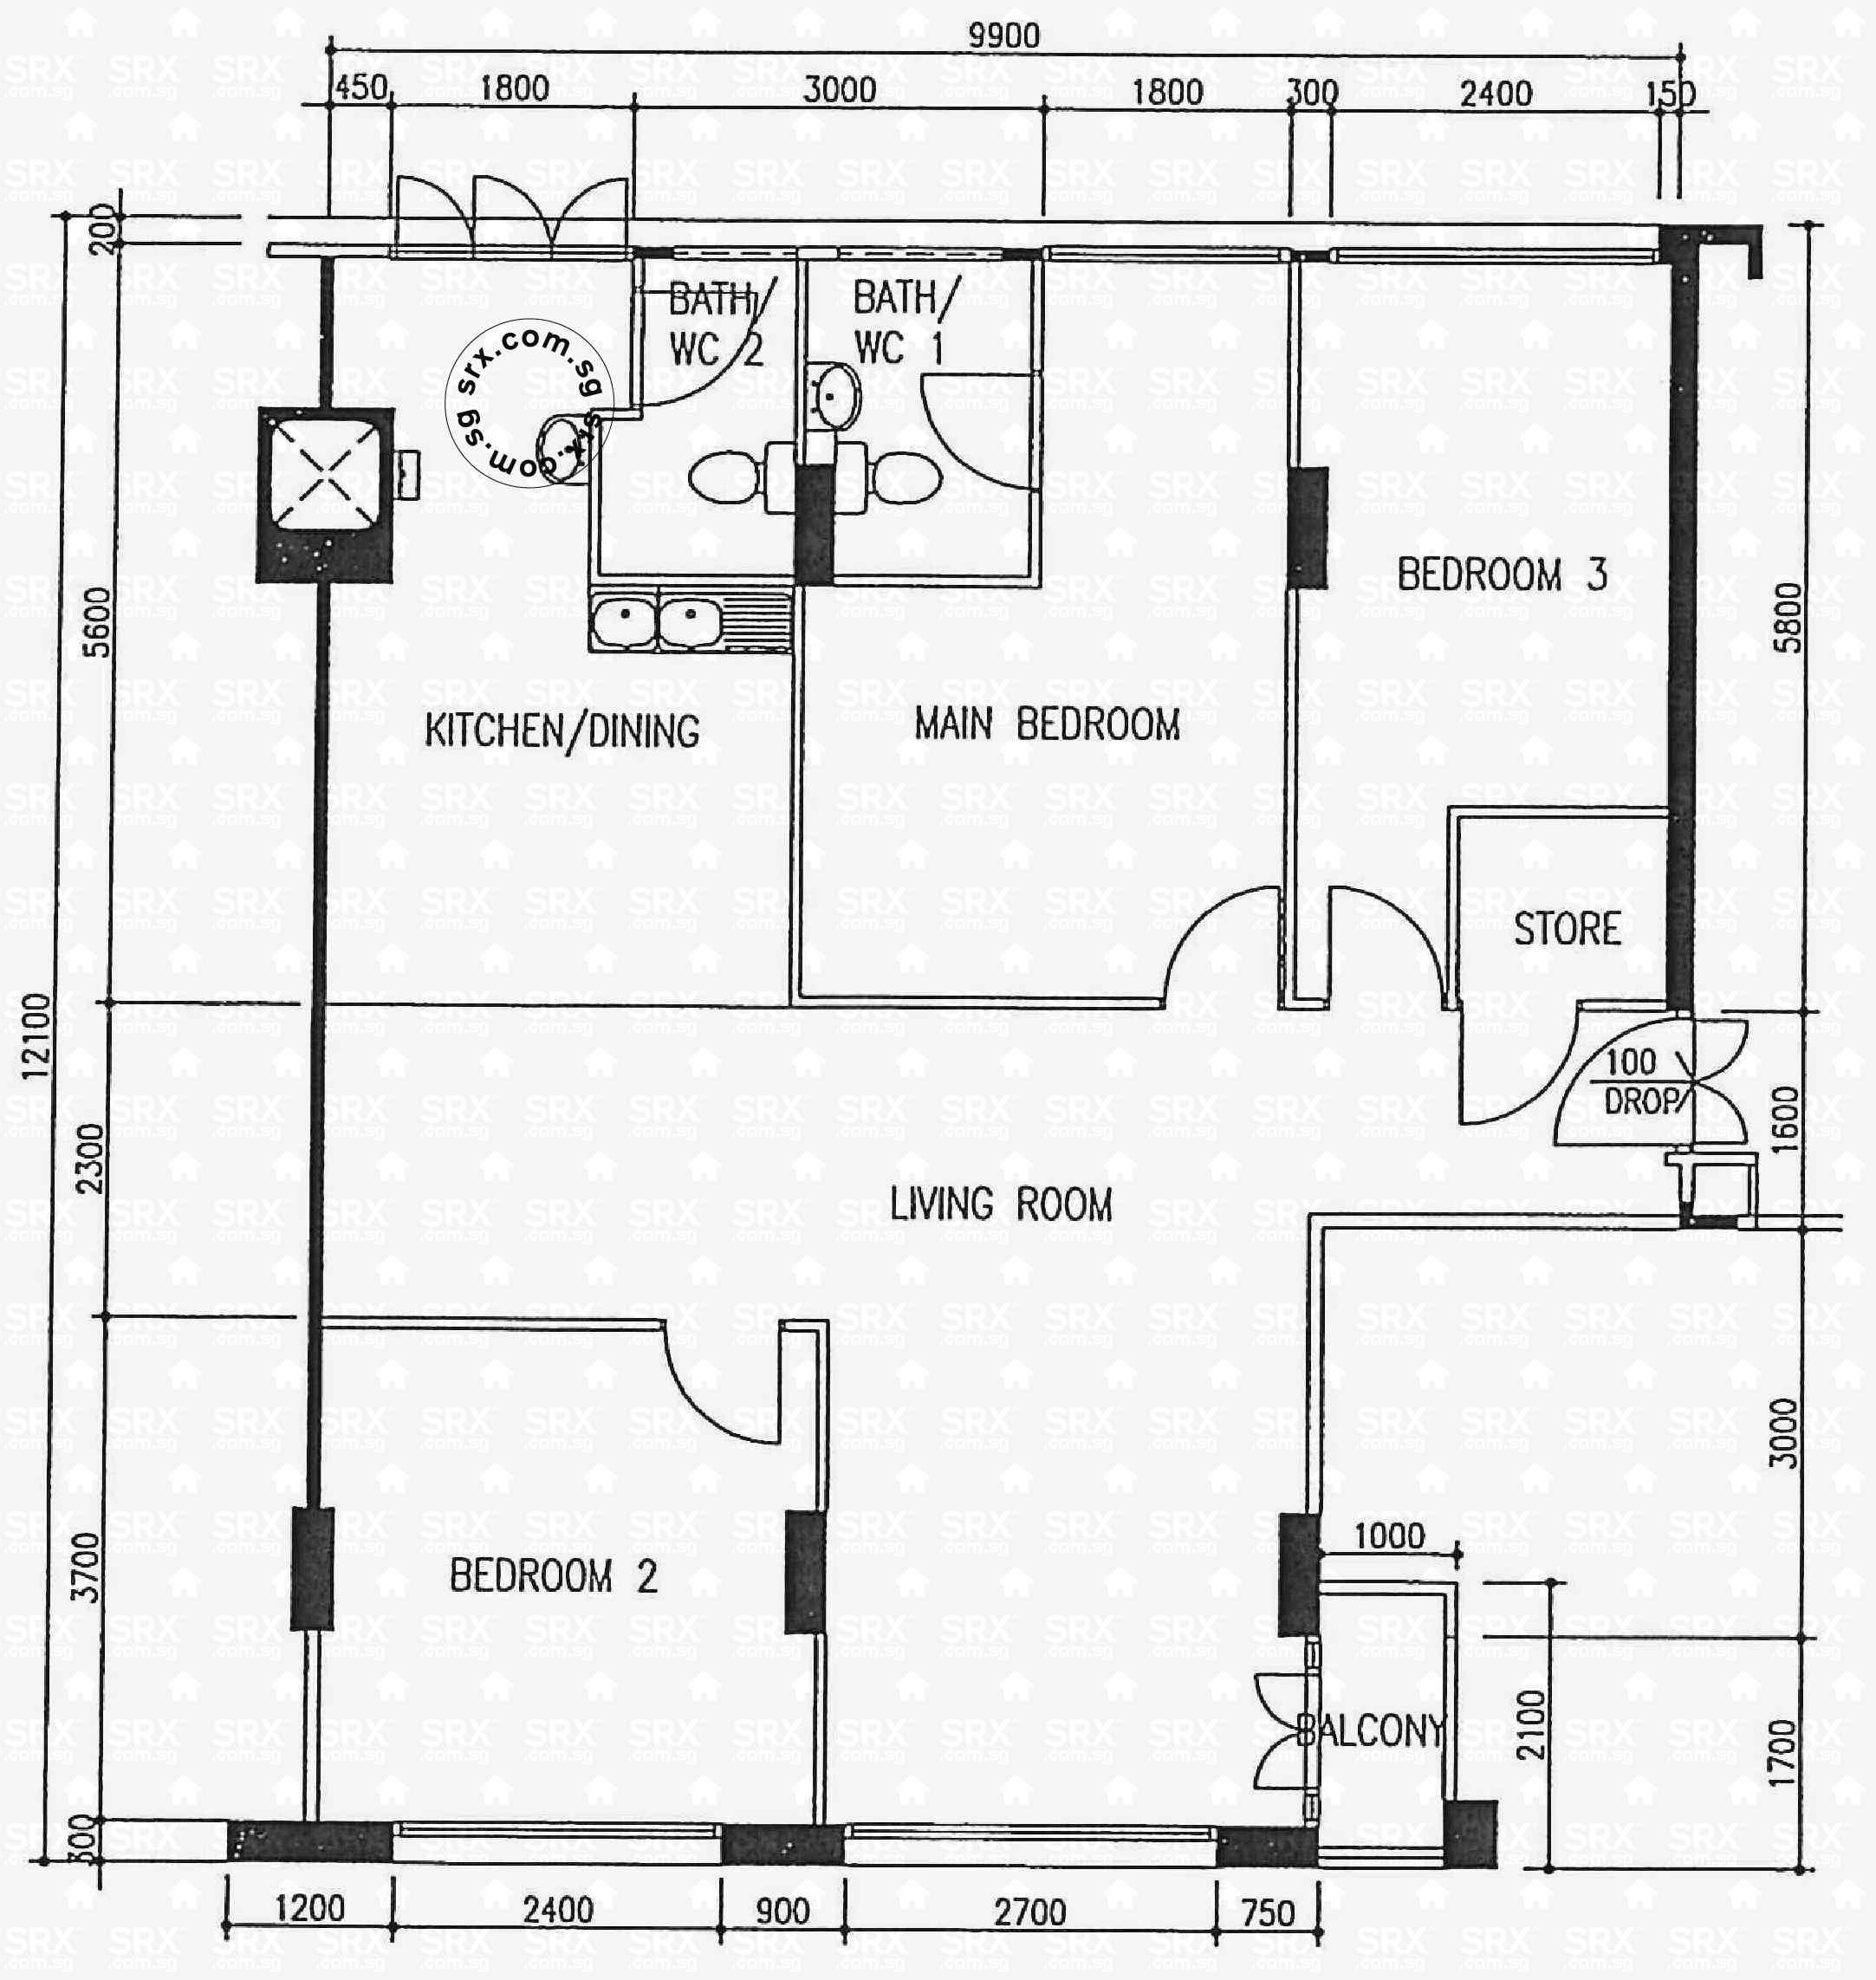 bishan street 23 hdb details srx property